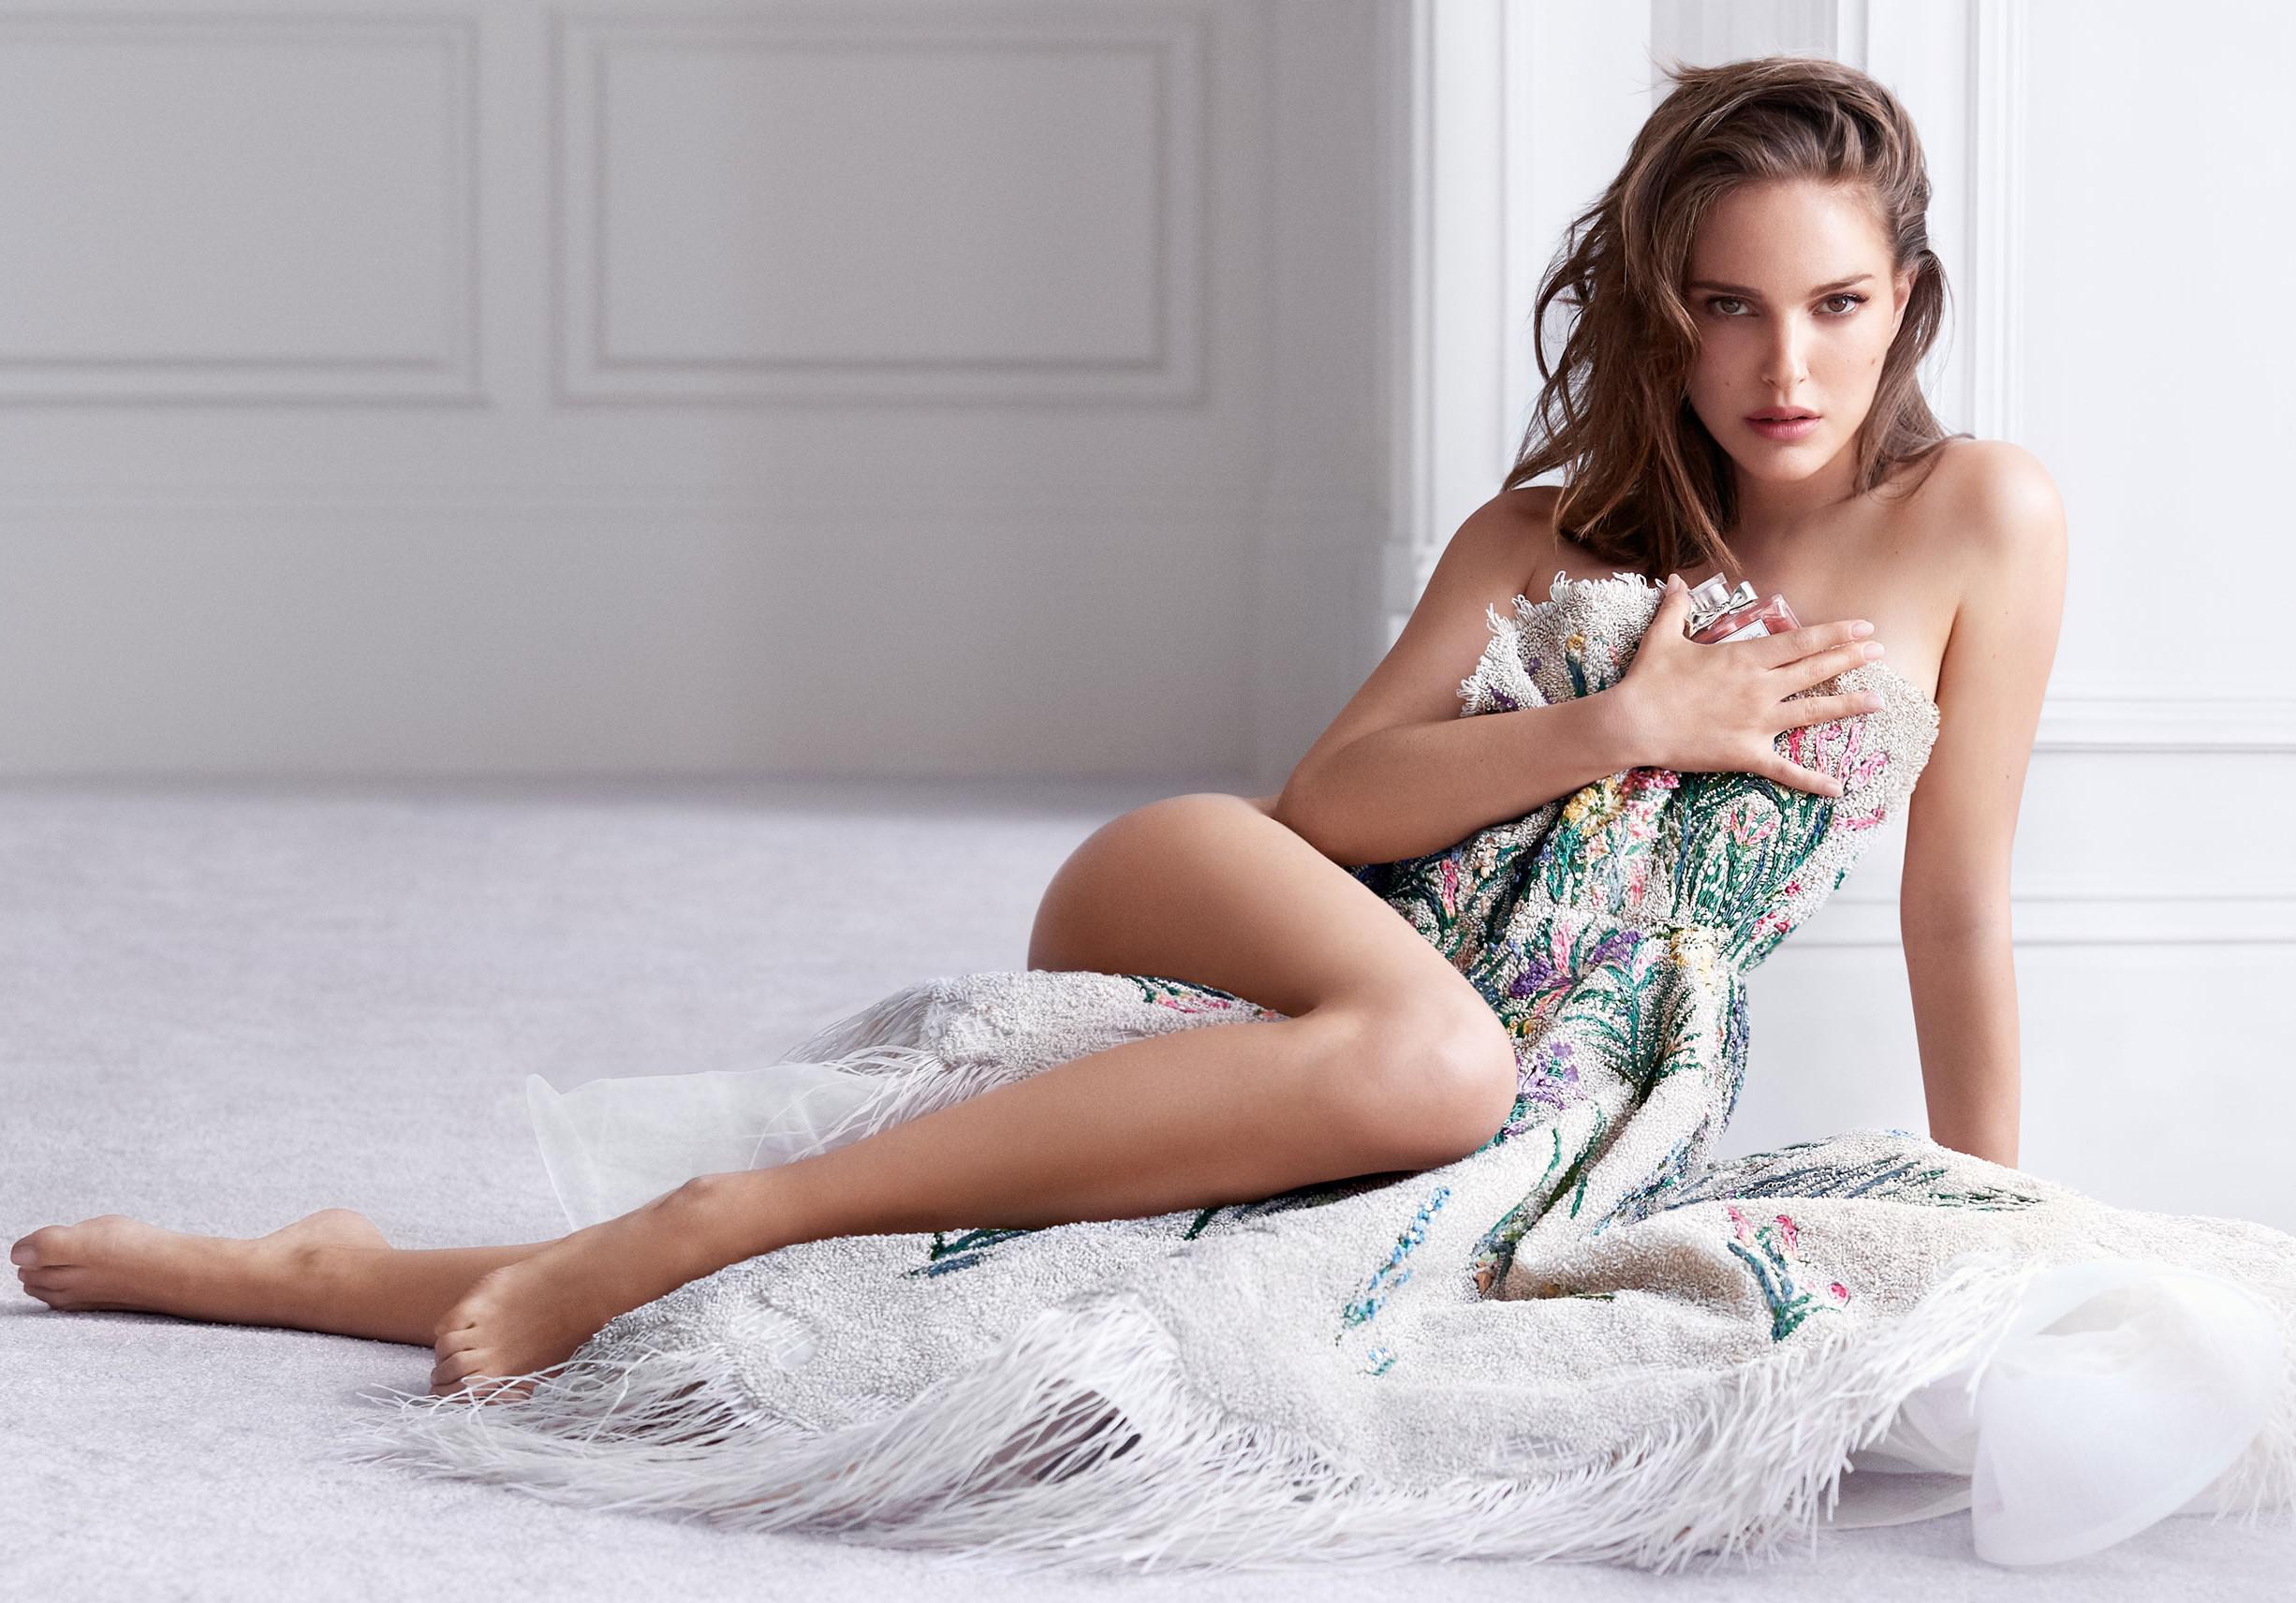 Natalie Portman Giving Femme Fatale Vibes